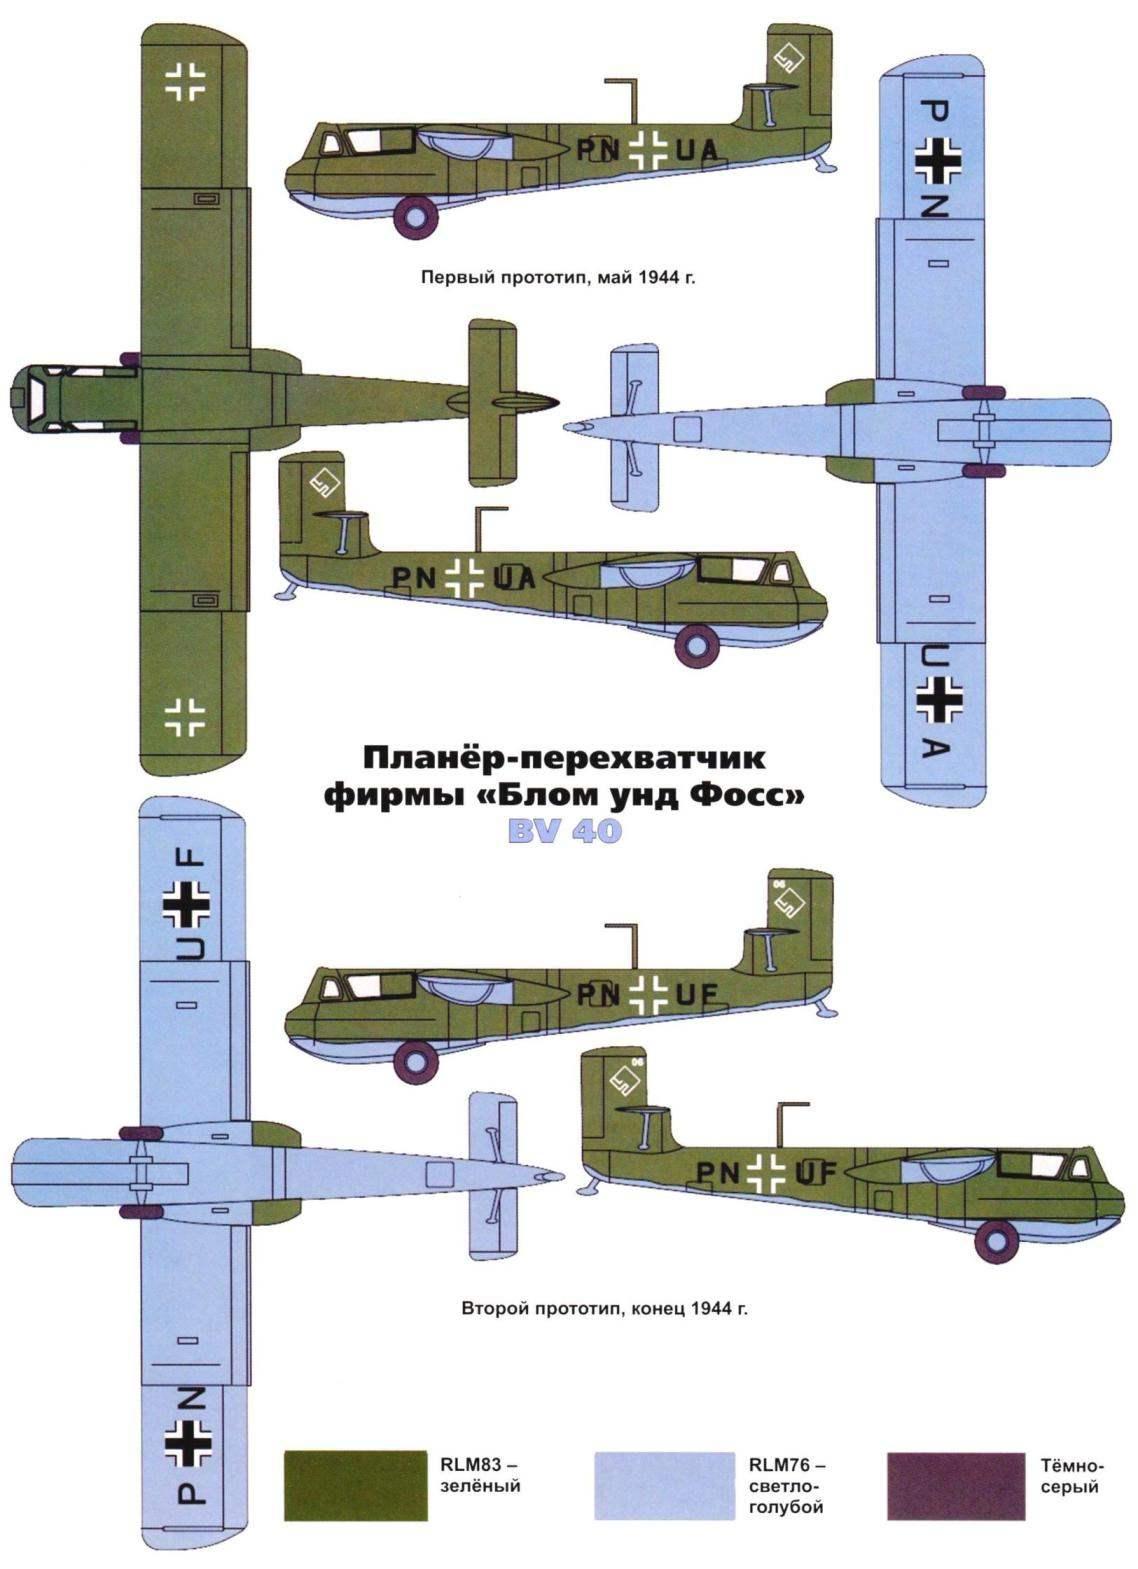 Планёр-перехватчик фирмы «Блом унд Фосс» BV 40